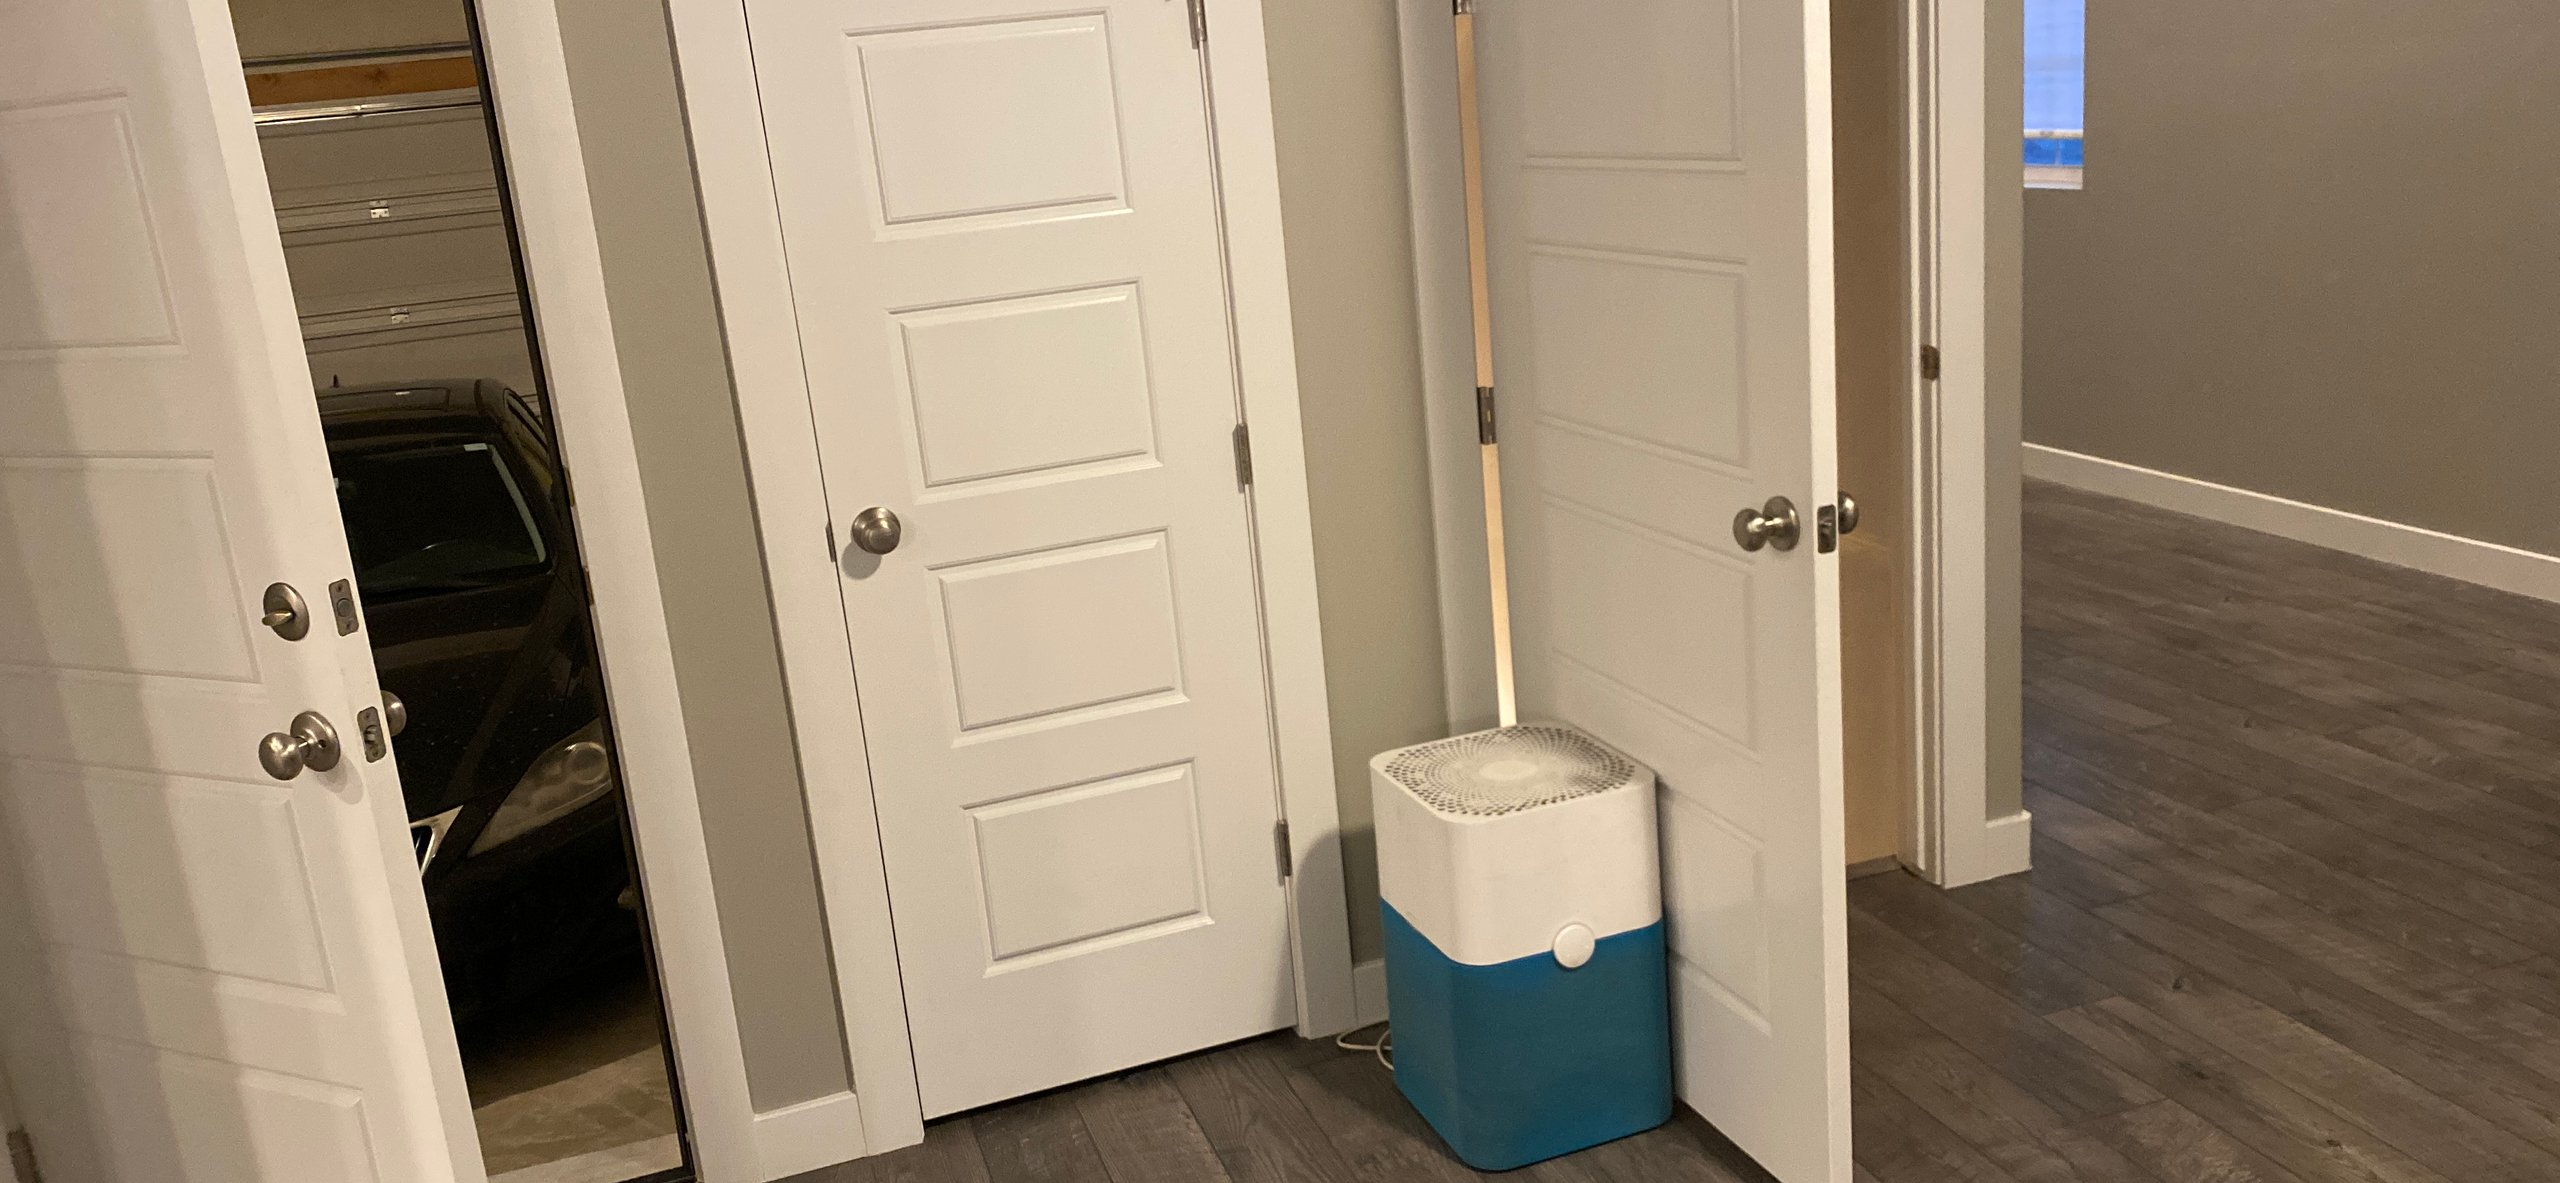 6x5 Basement self storage unit